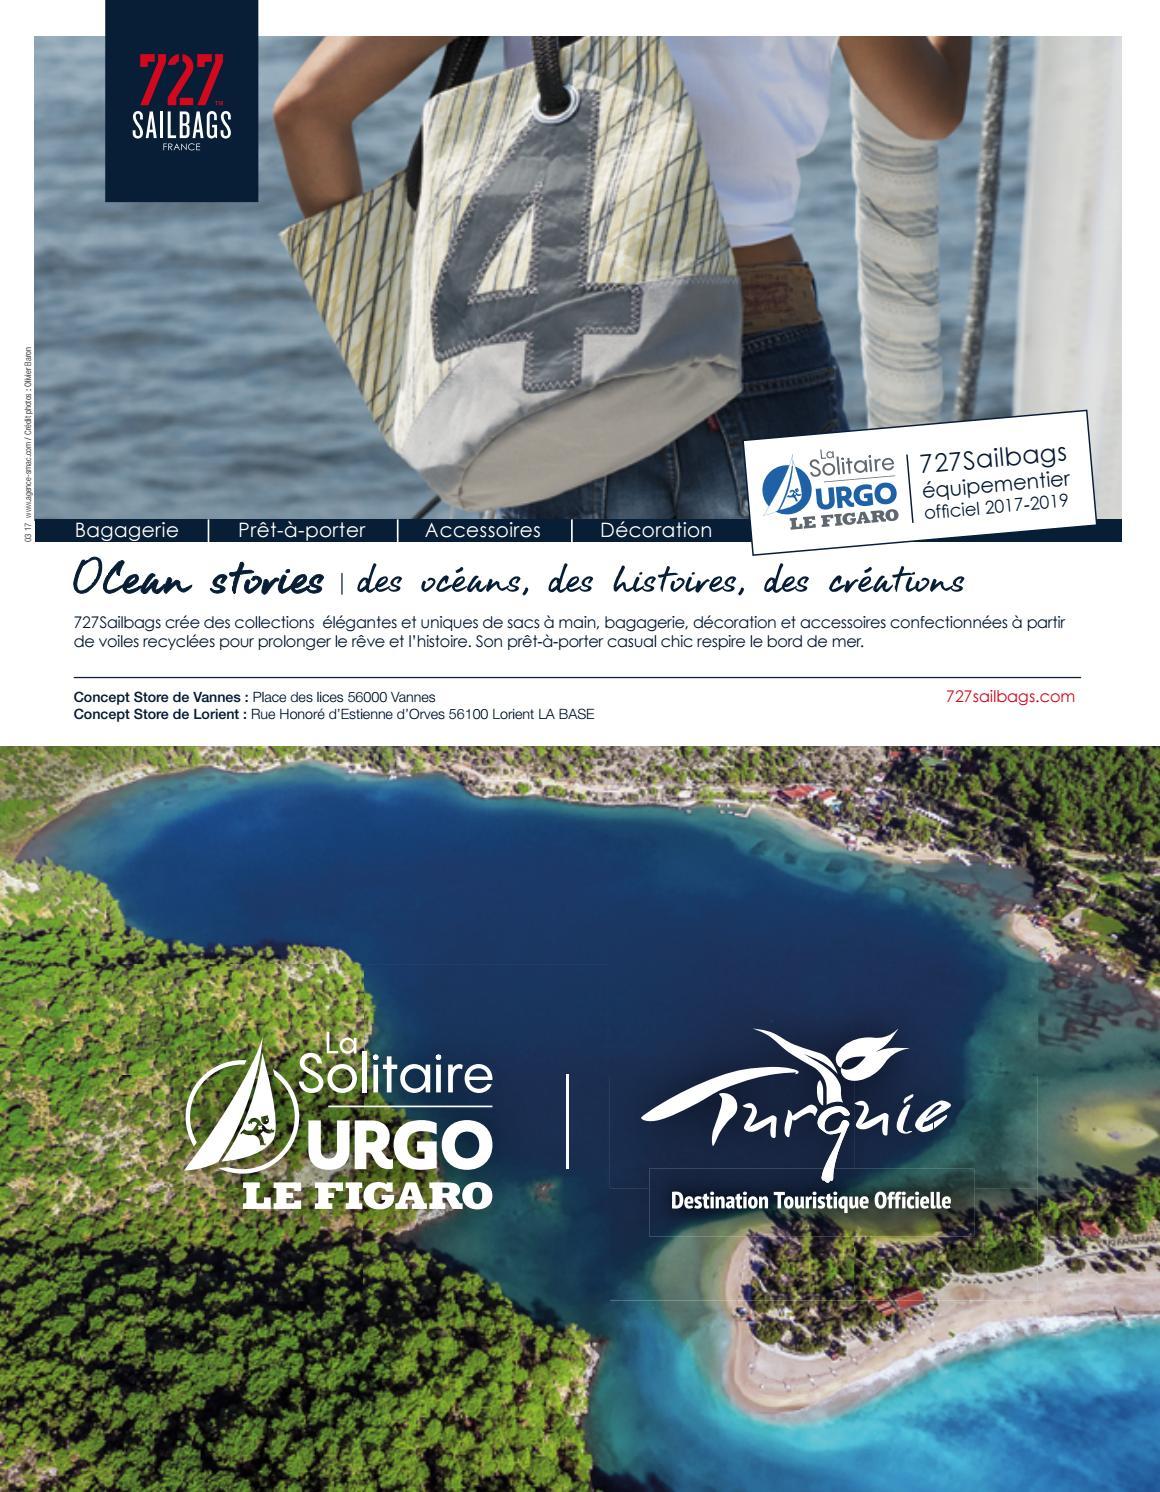 la solitaire urgo figaro - guide officiel 2017oc sport - issuu